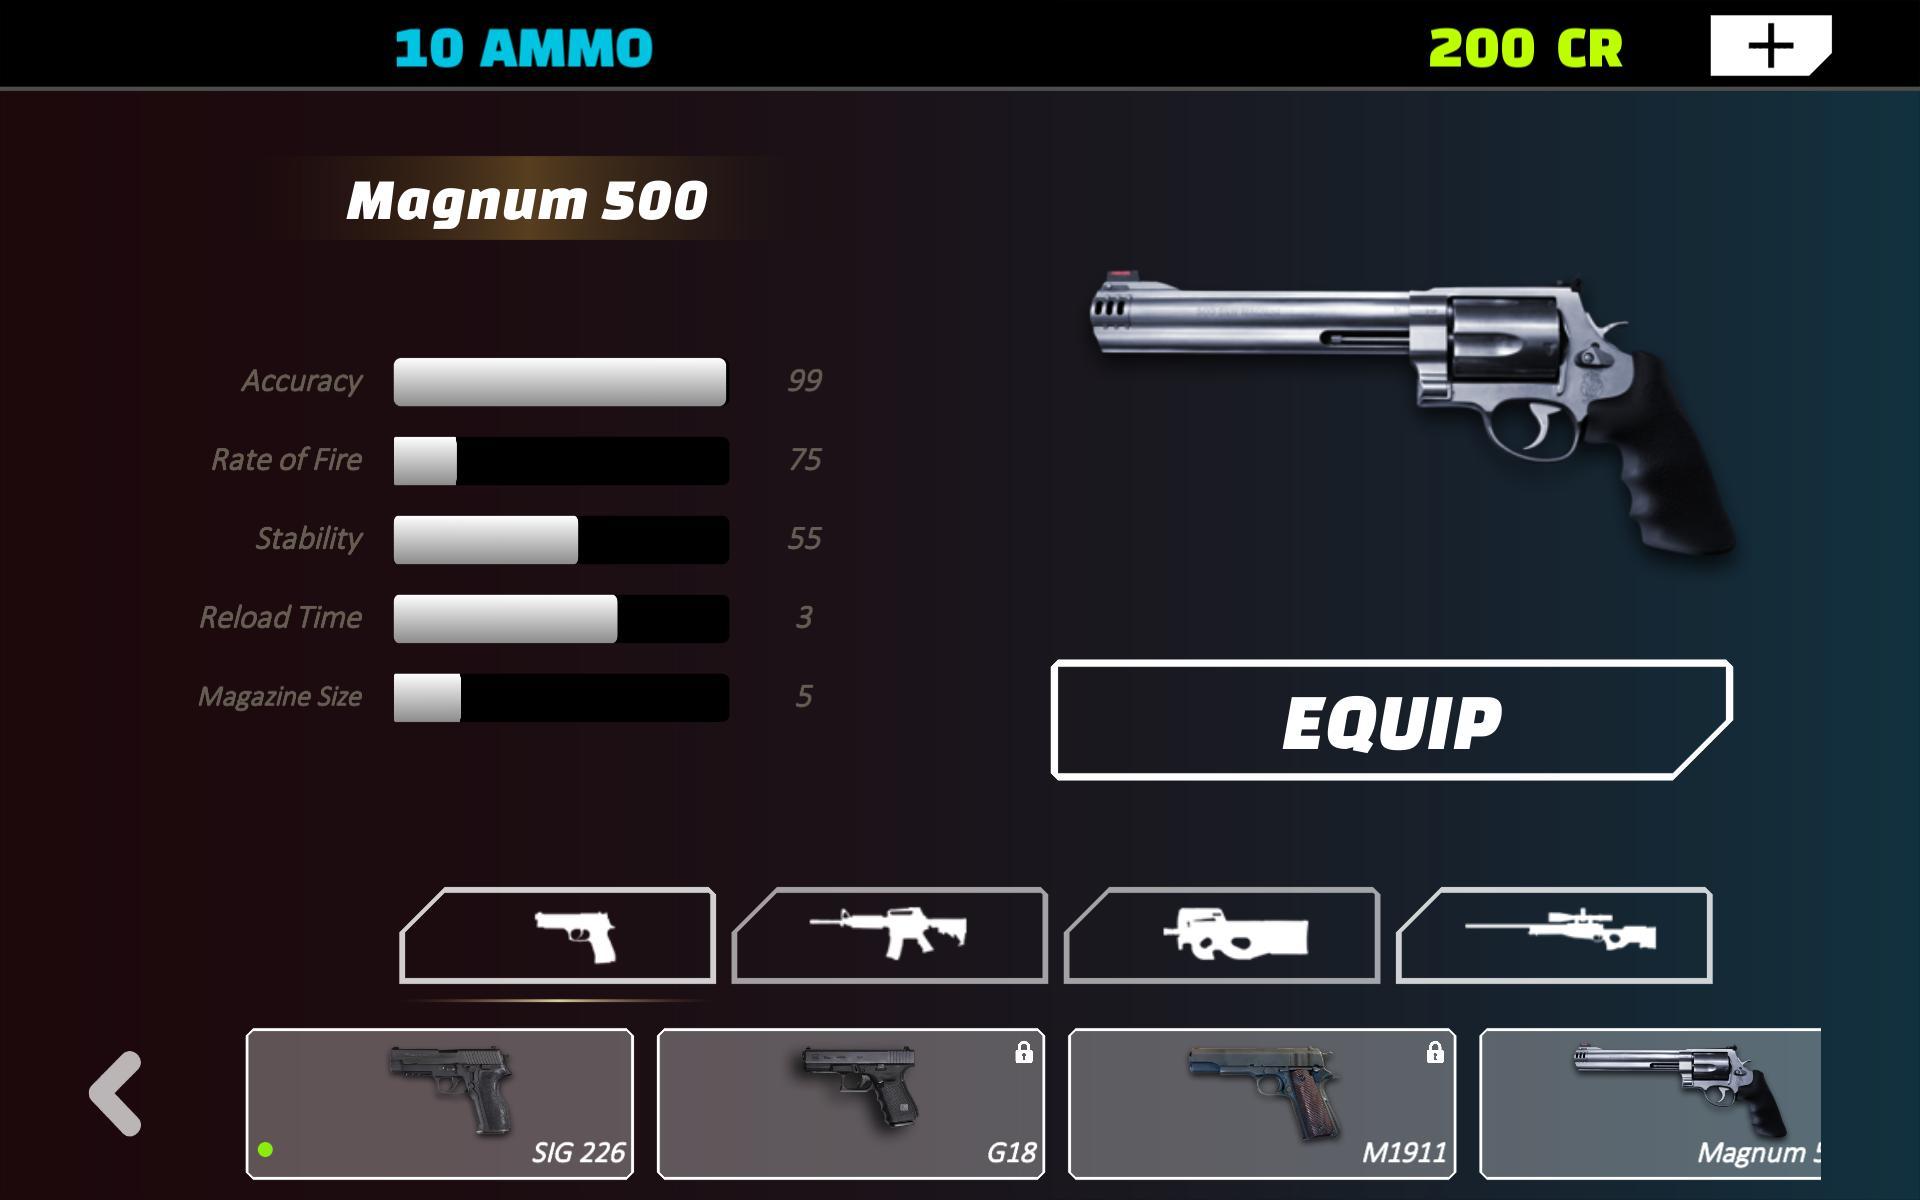 Canyon Shooting 2 - Free Shooting Range 3.0.6 Screenshot 16